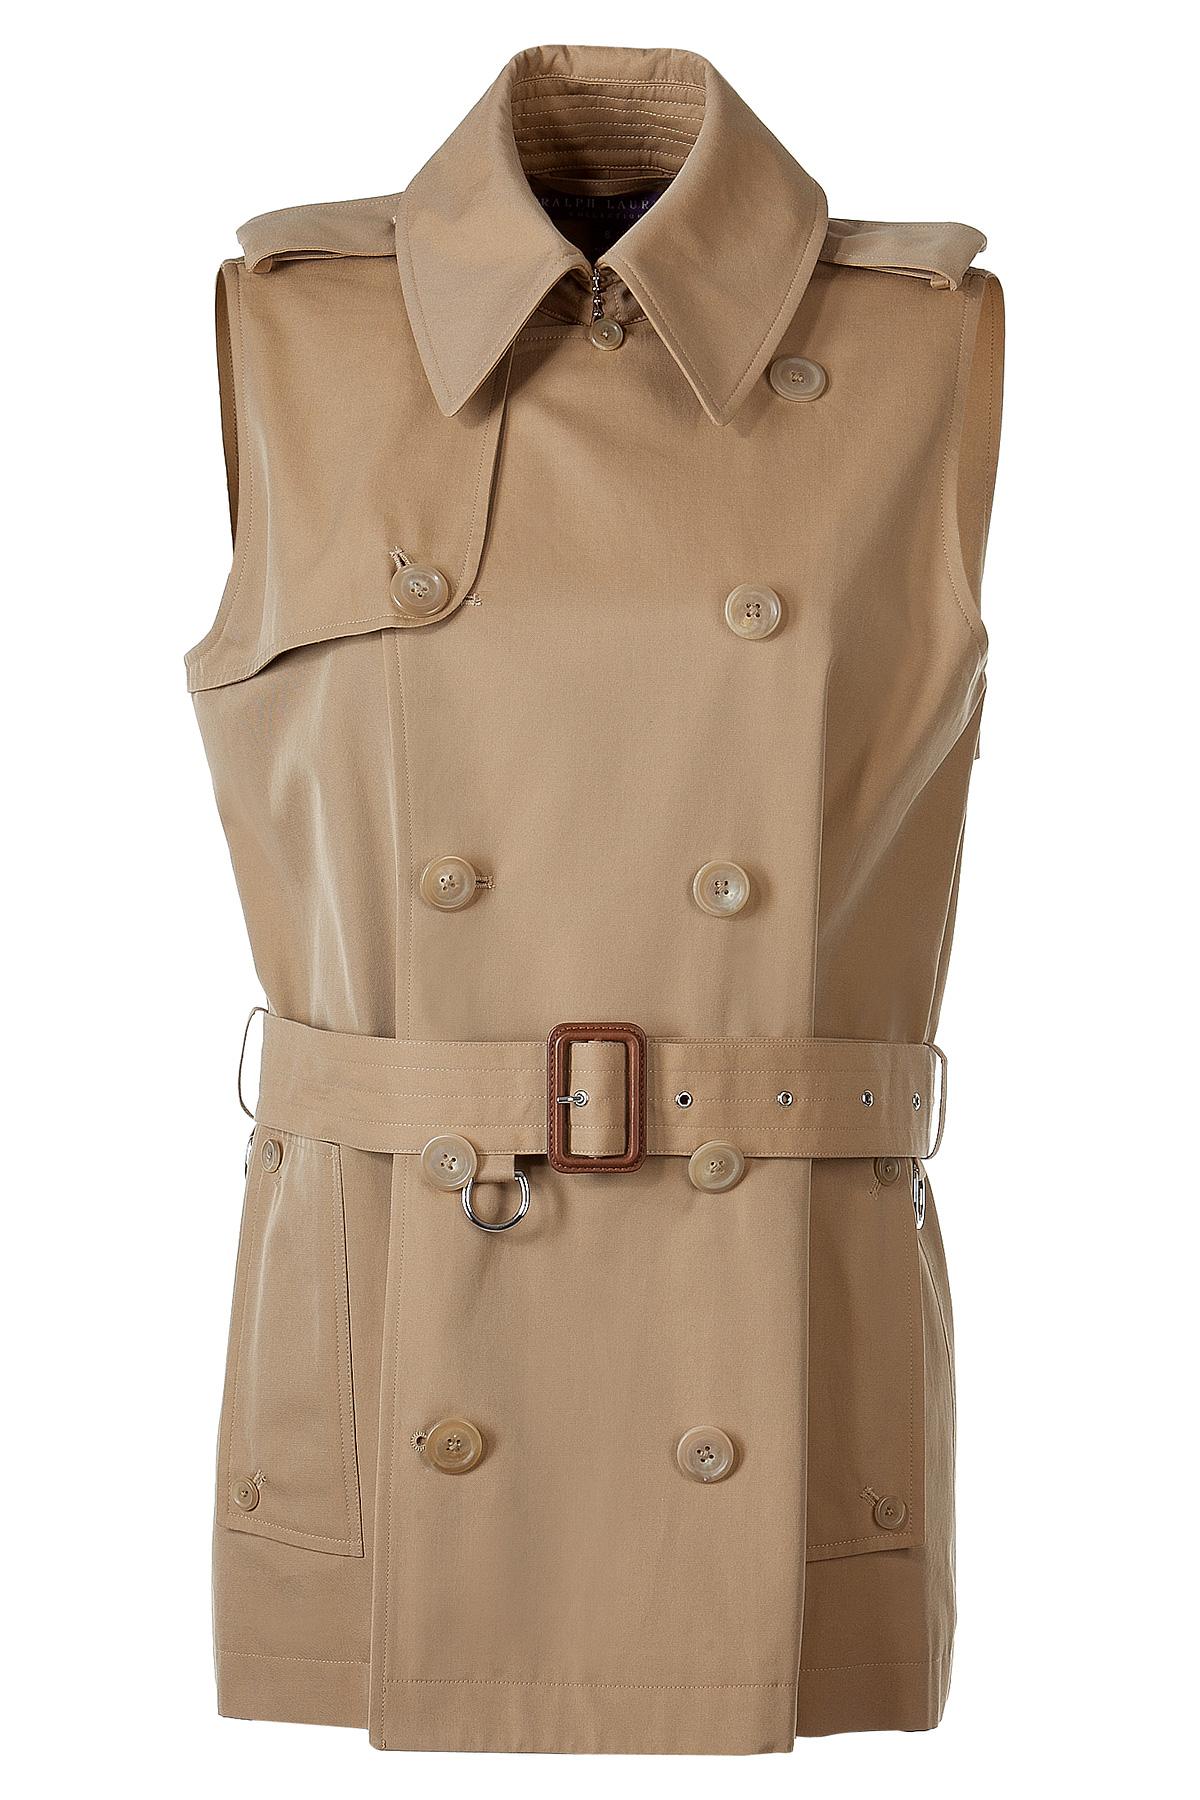 Ralph Lauren Collection Vintage Khaki Sleeveless Trench